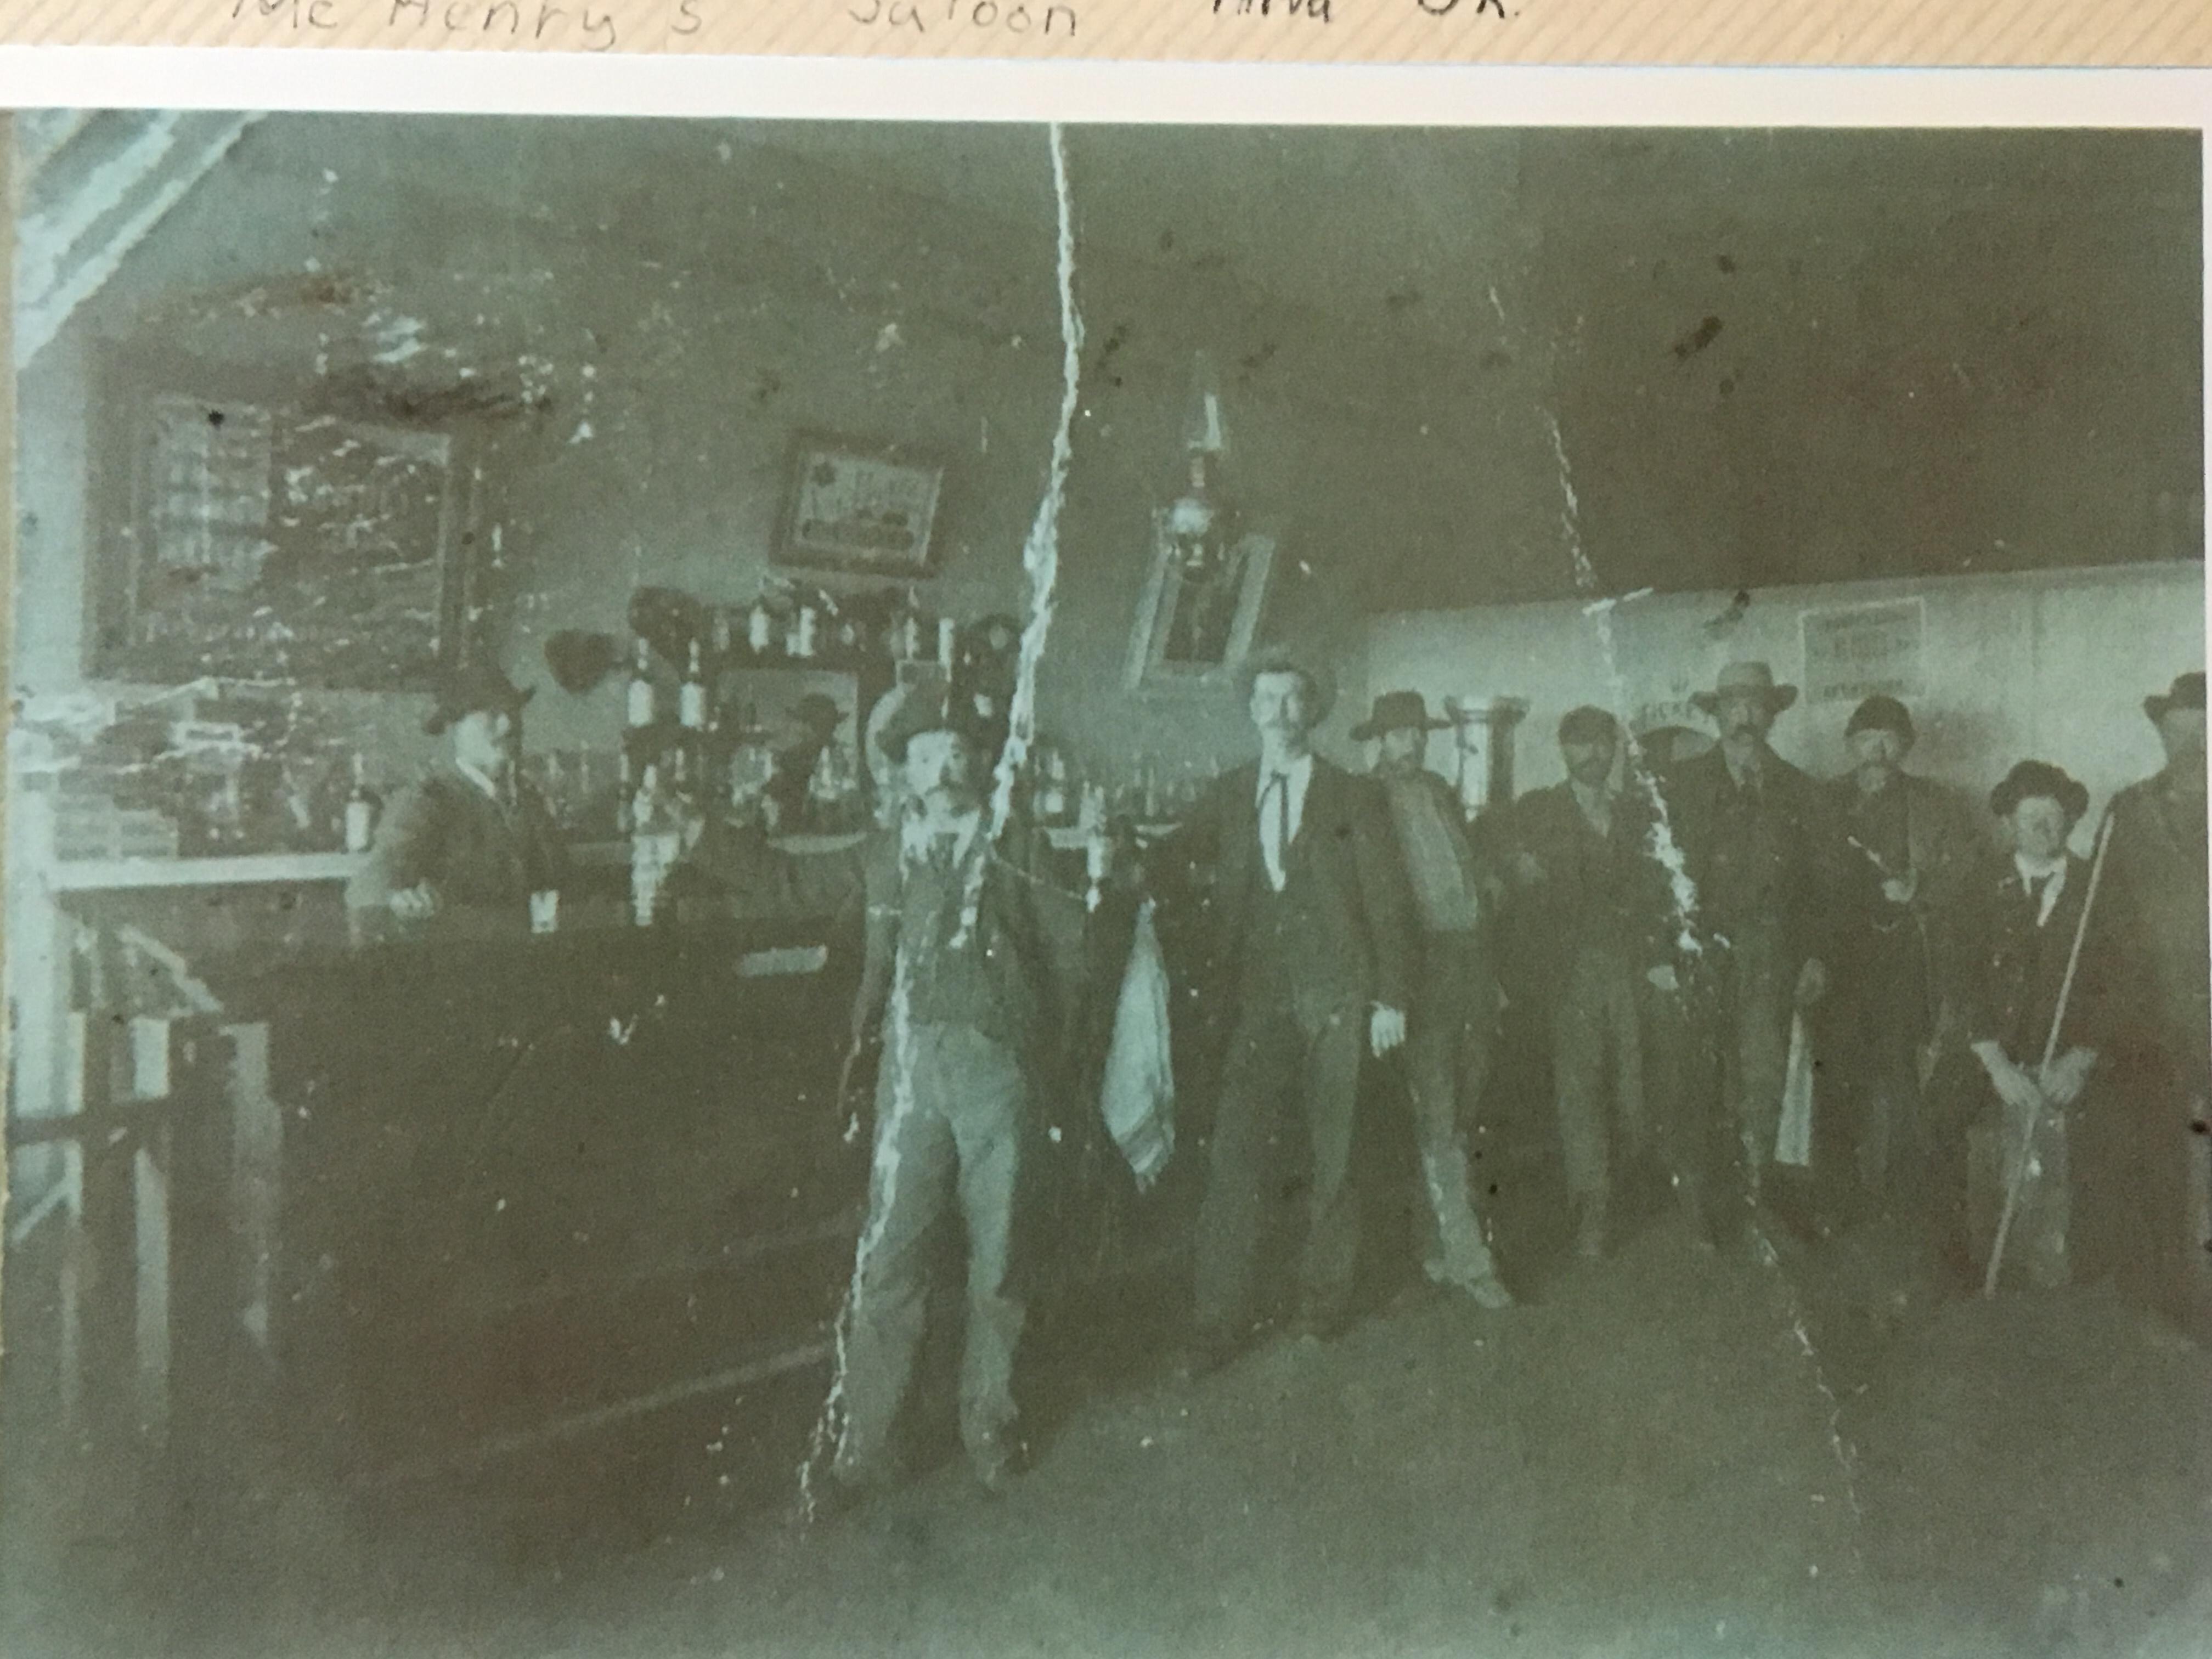 Isaac McHenry's Saloon - Woods County, Okllahoma